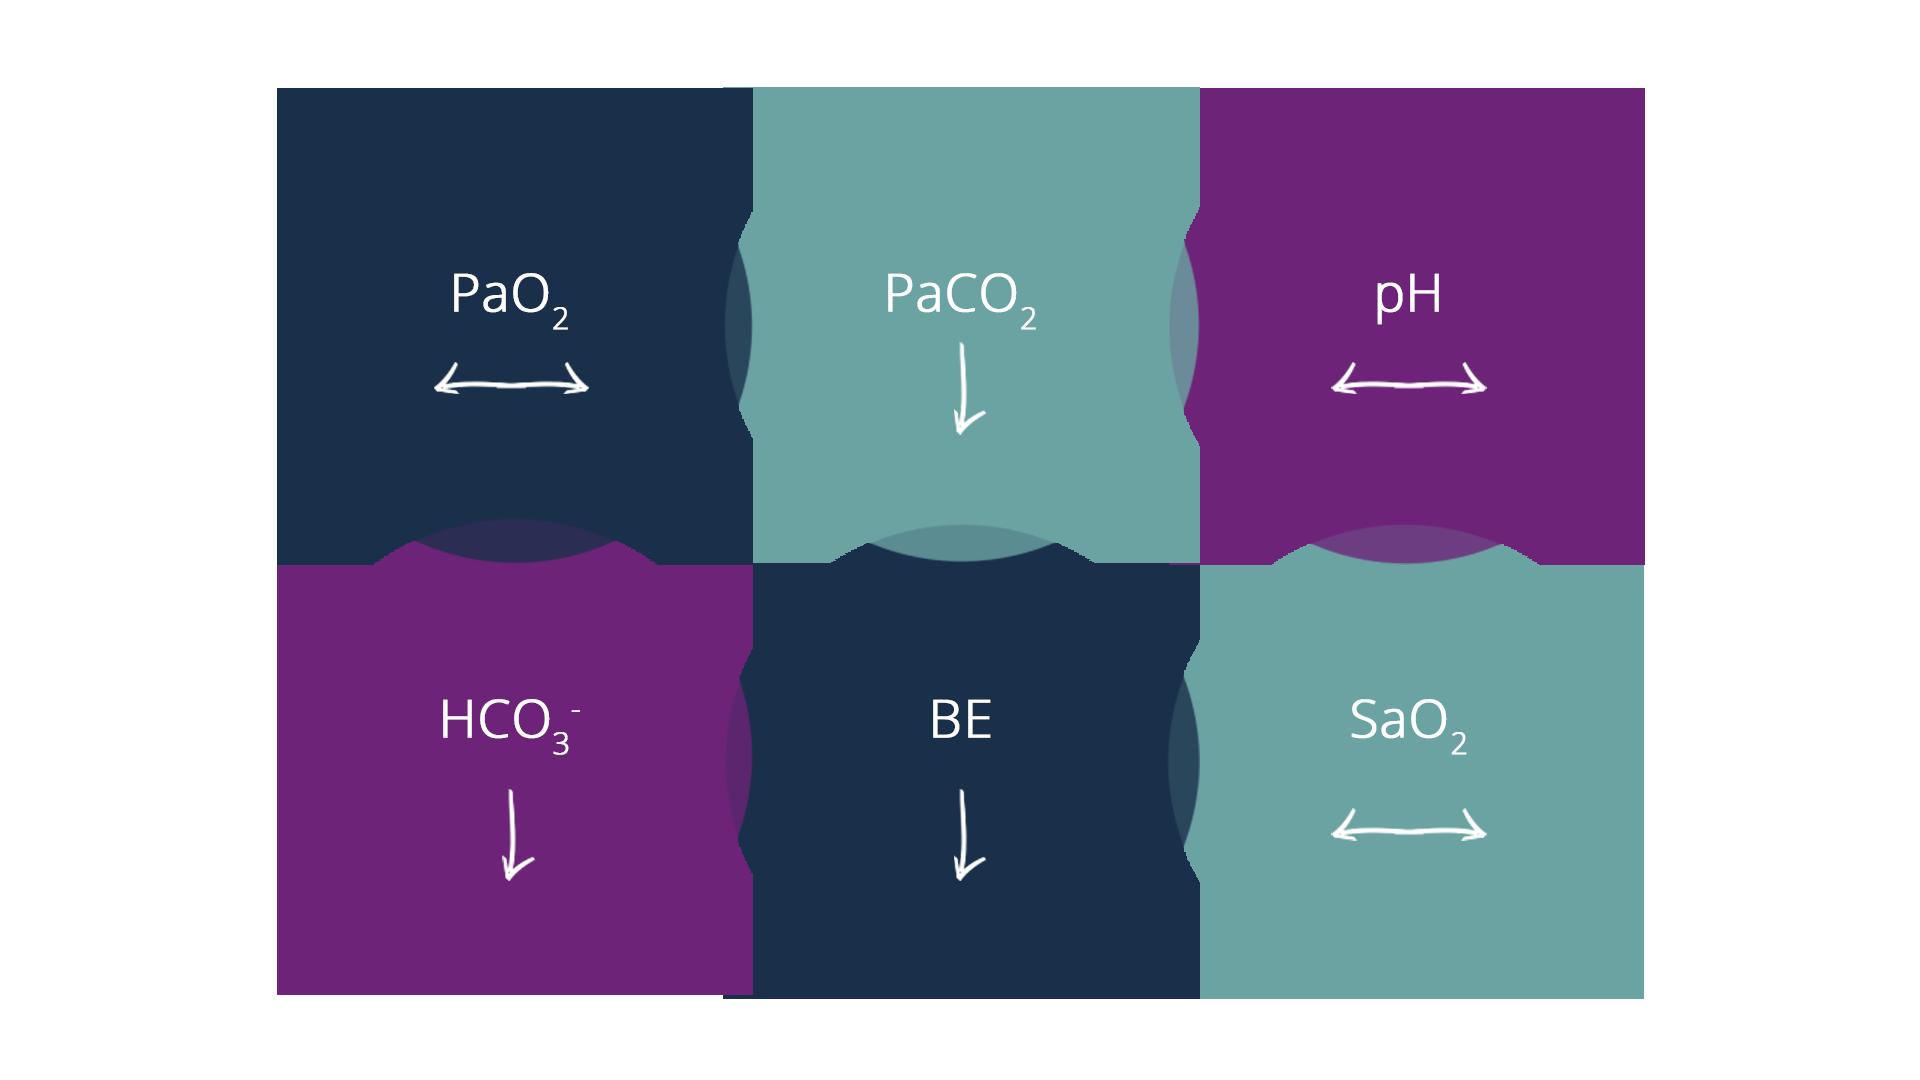 Metabolic acidosis with respiratory compensation